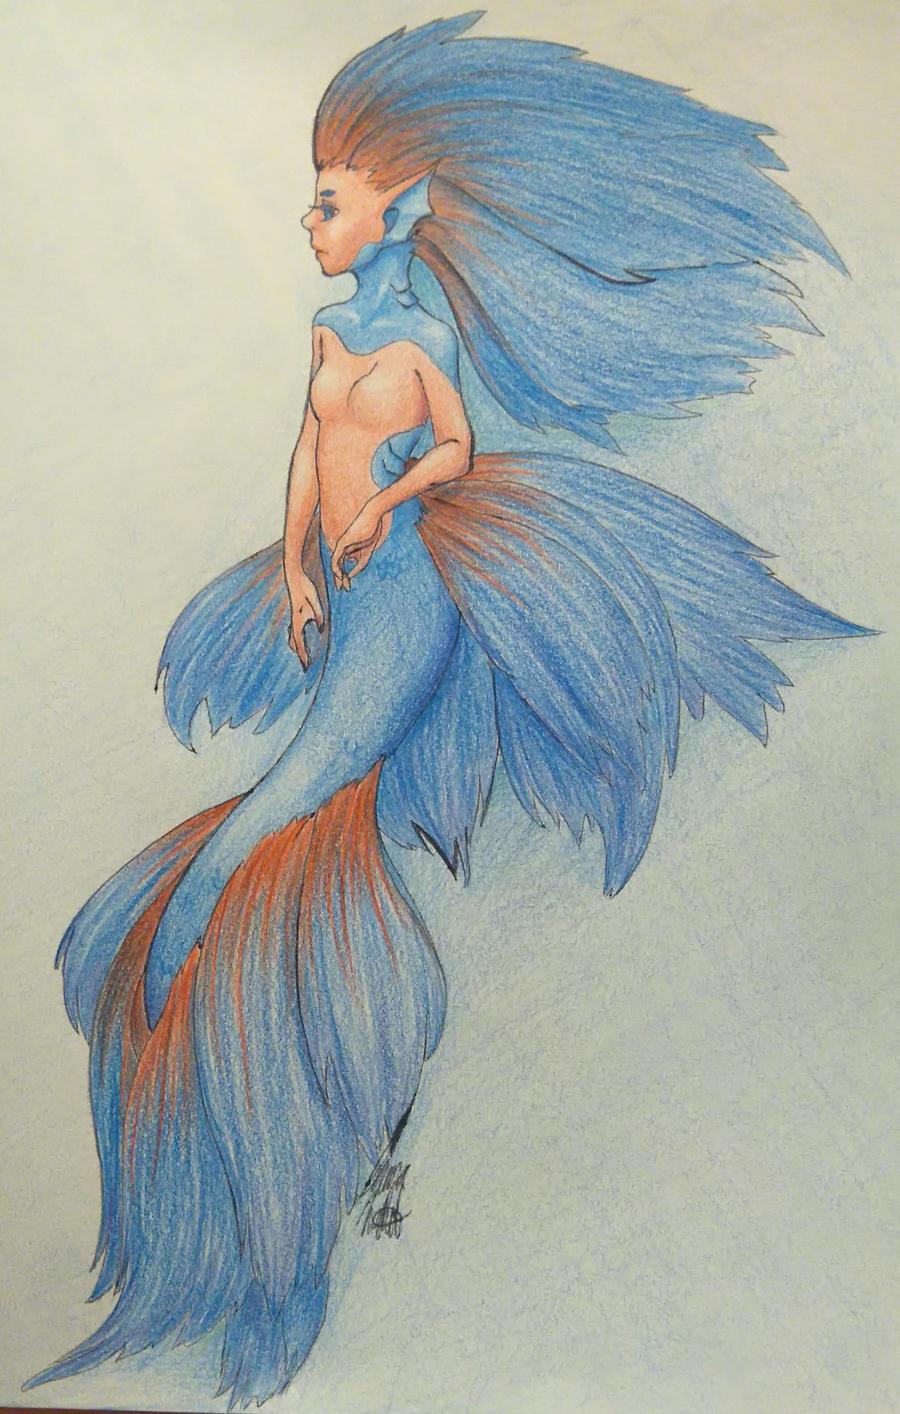 Betta fish mermaid by jenna-aw